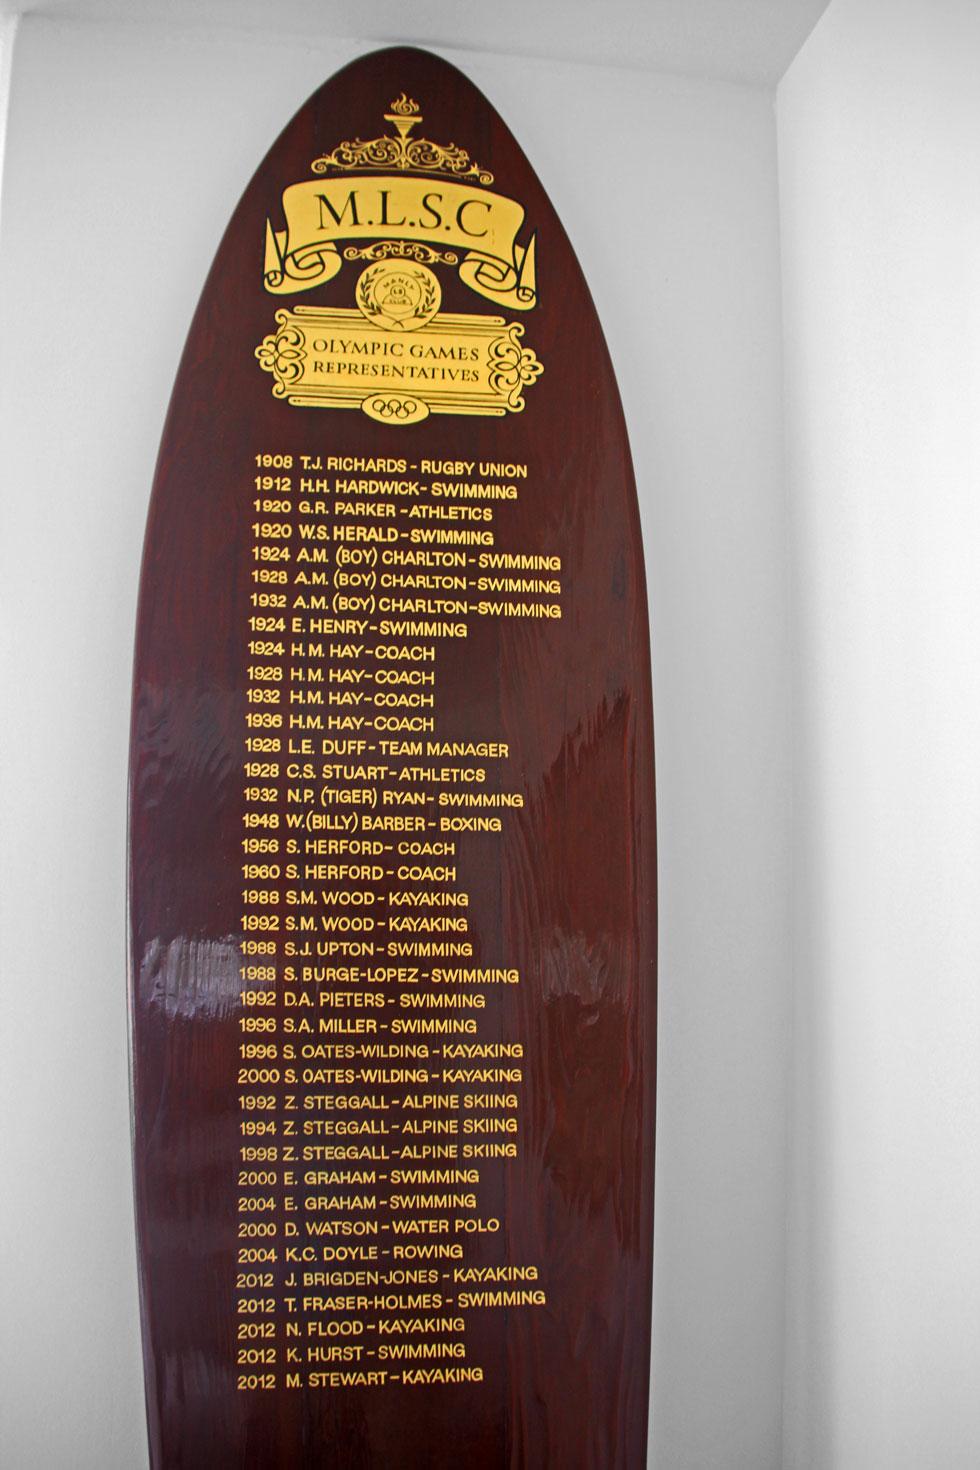 MLSC Roll of Honour